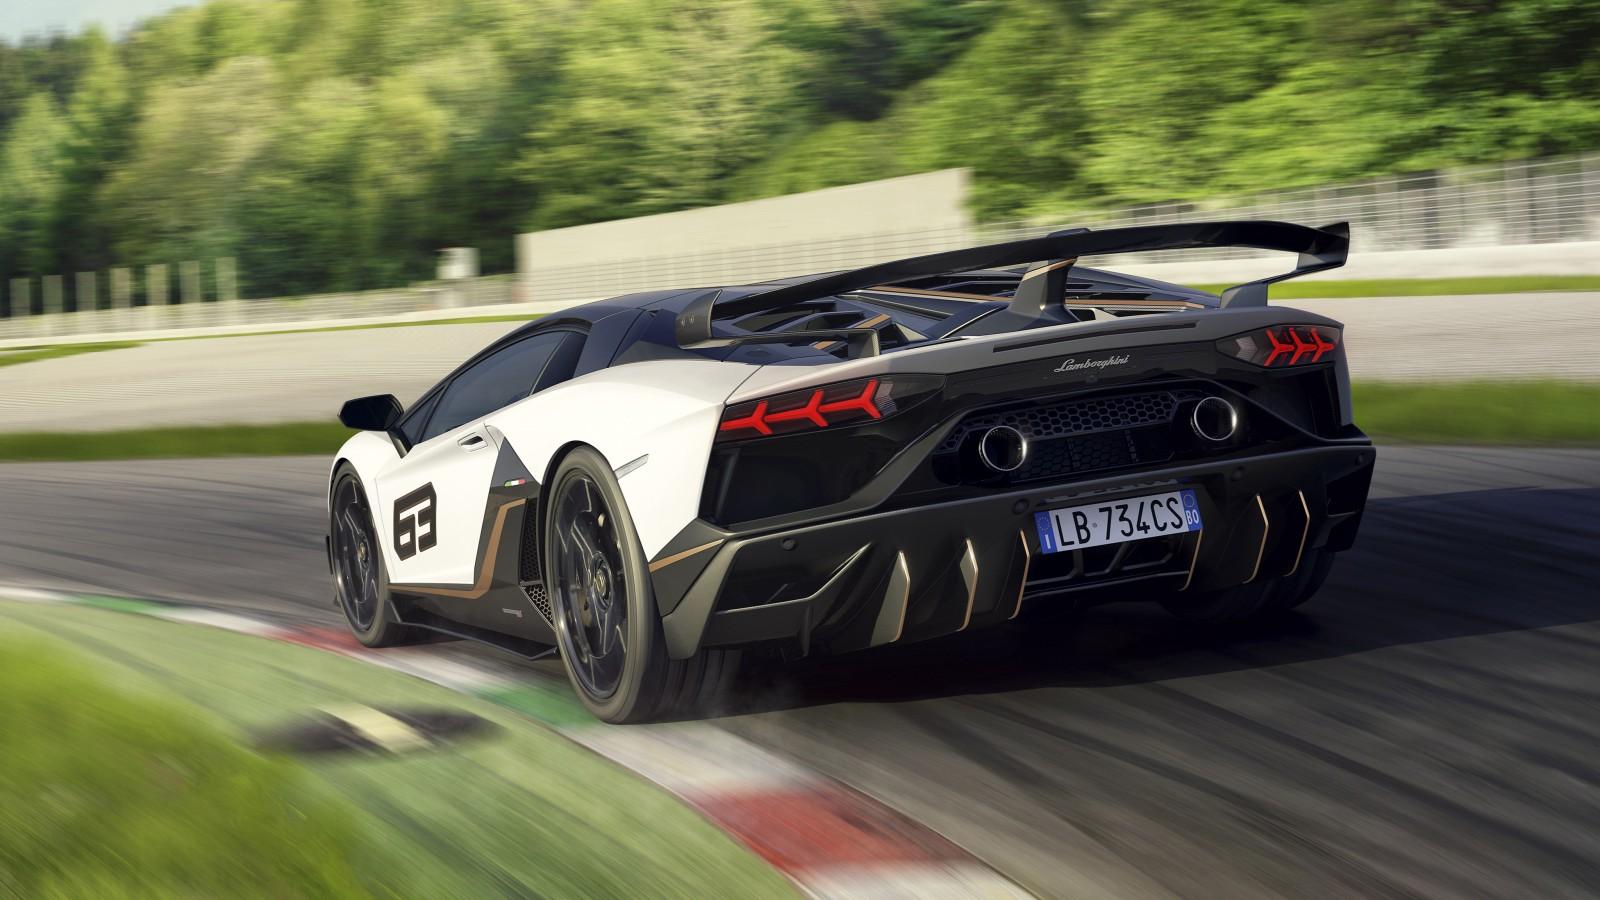 Lamborghini Aventador Svj 63 2019 4k 8 Wallpaper Hd Car Wallpapers Id 11026